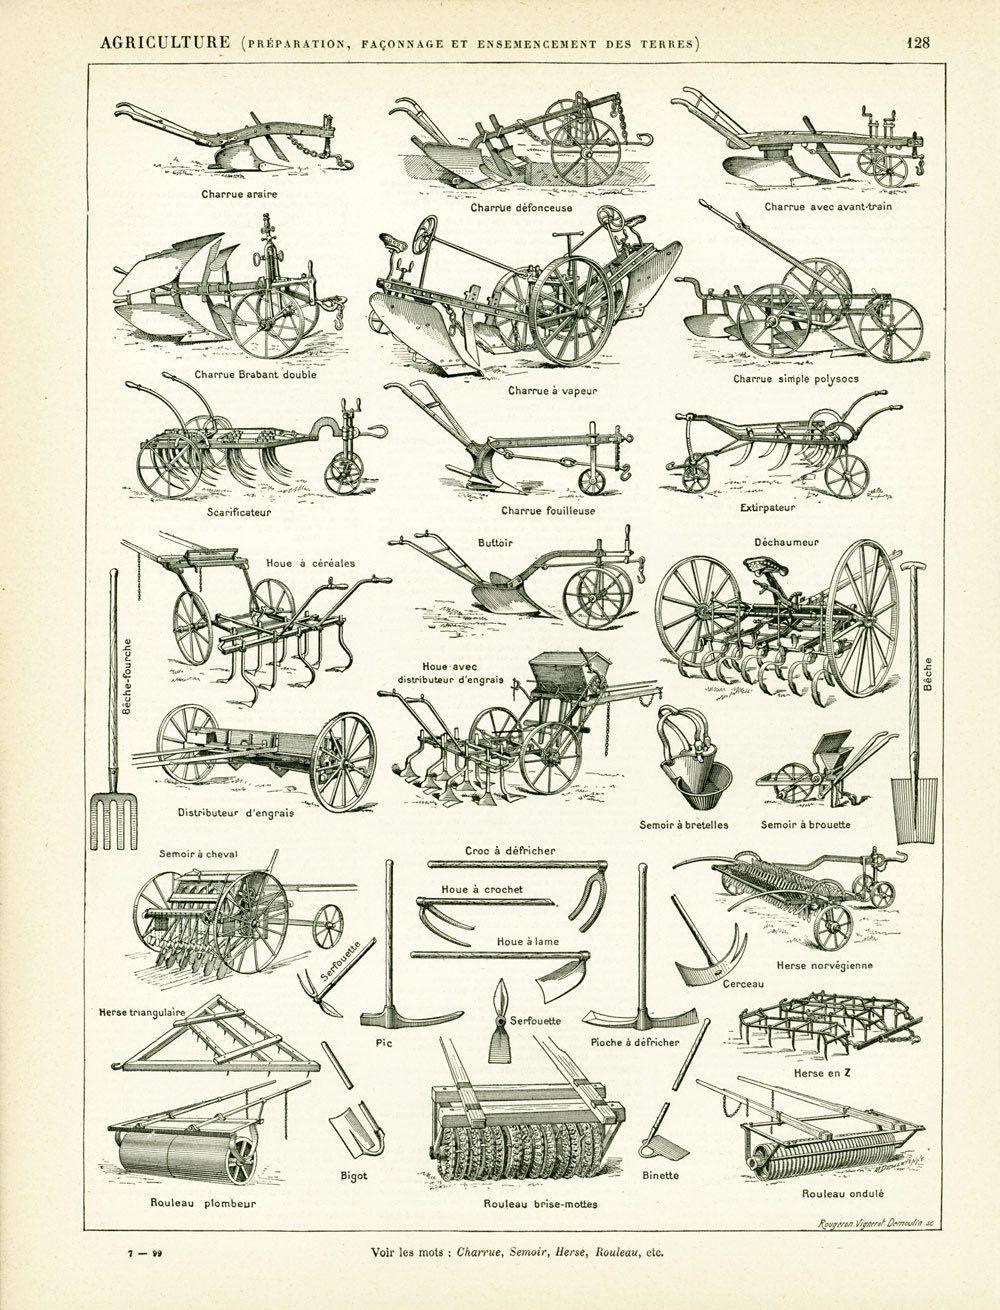 1897 materiel agricole ancien collection charrue semoir herse petit outillage illustration. Black Bedroom Furniture Sets. Home Design Ideas